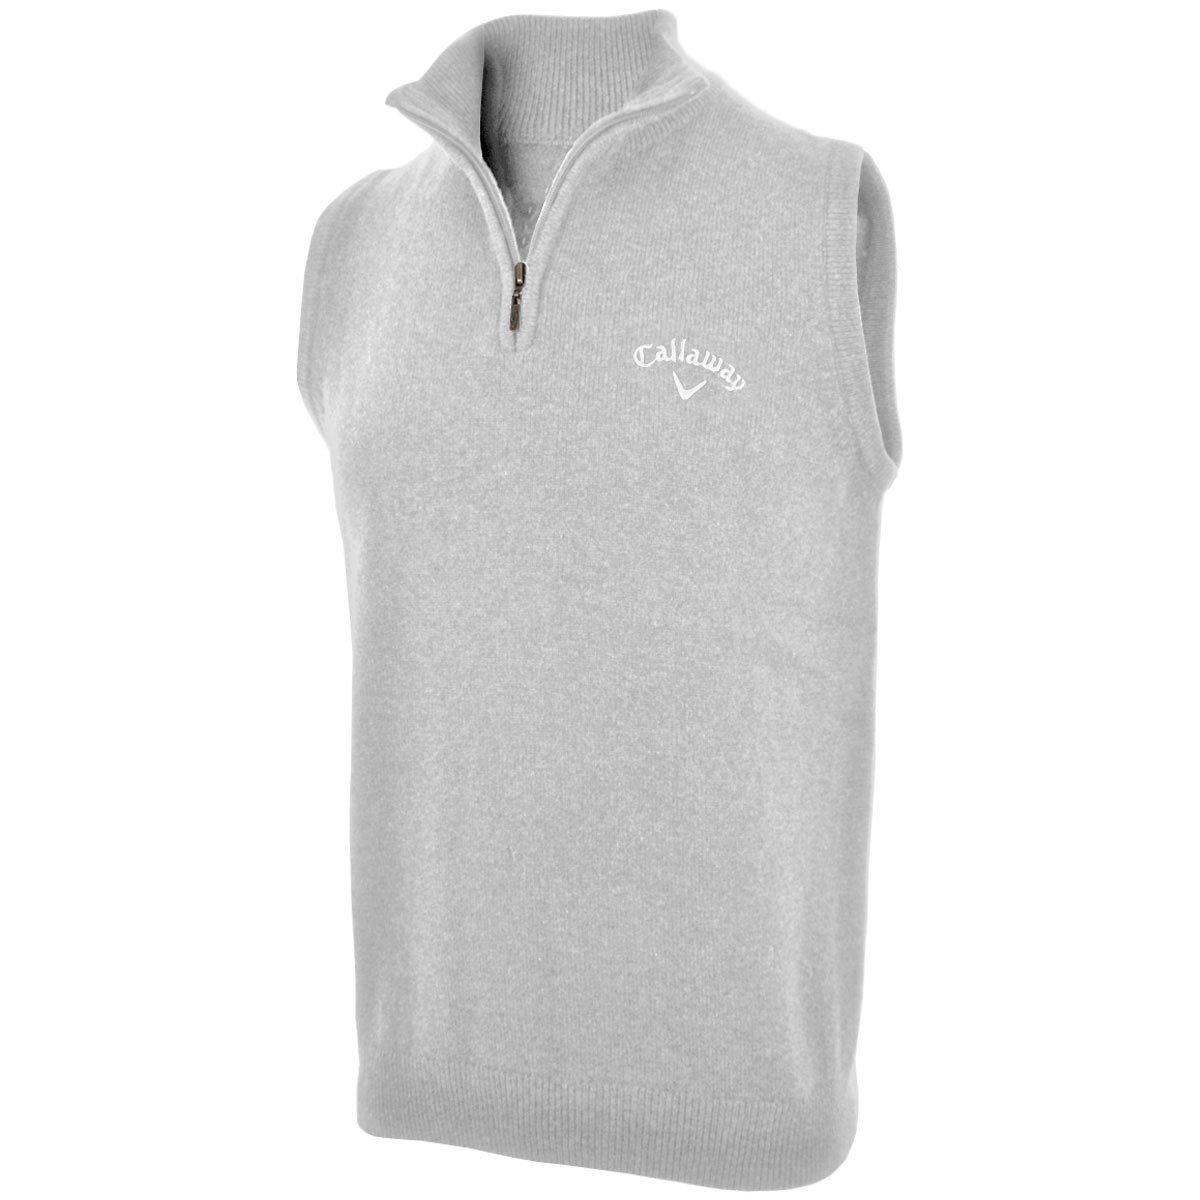 c0d41f750 Get Quotations · 2014 Callaway Zip Neck Golf Sweater Vest Wool Tank Top Mens  Slipover High Rise Medium